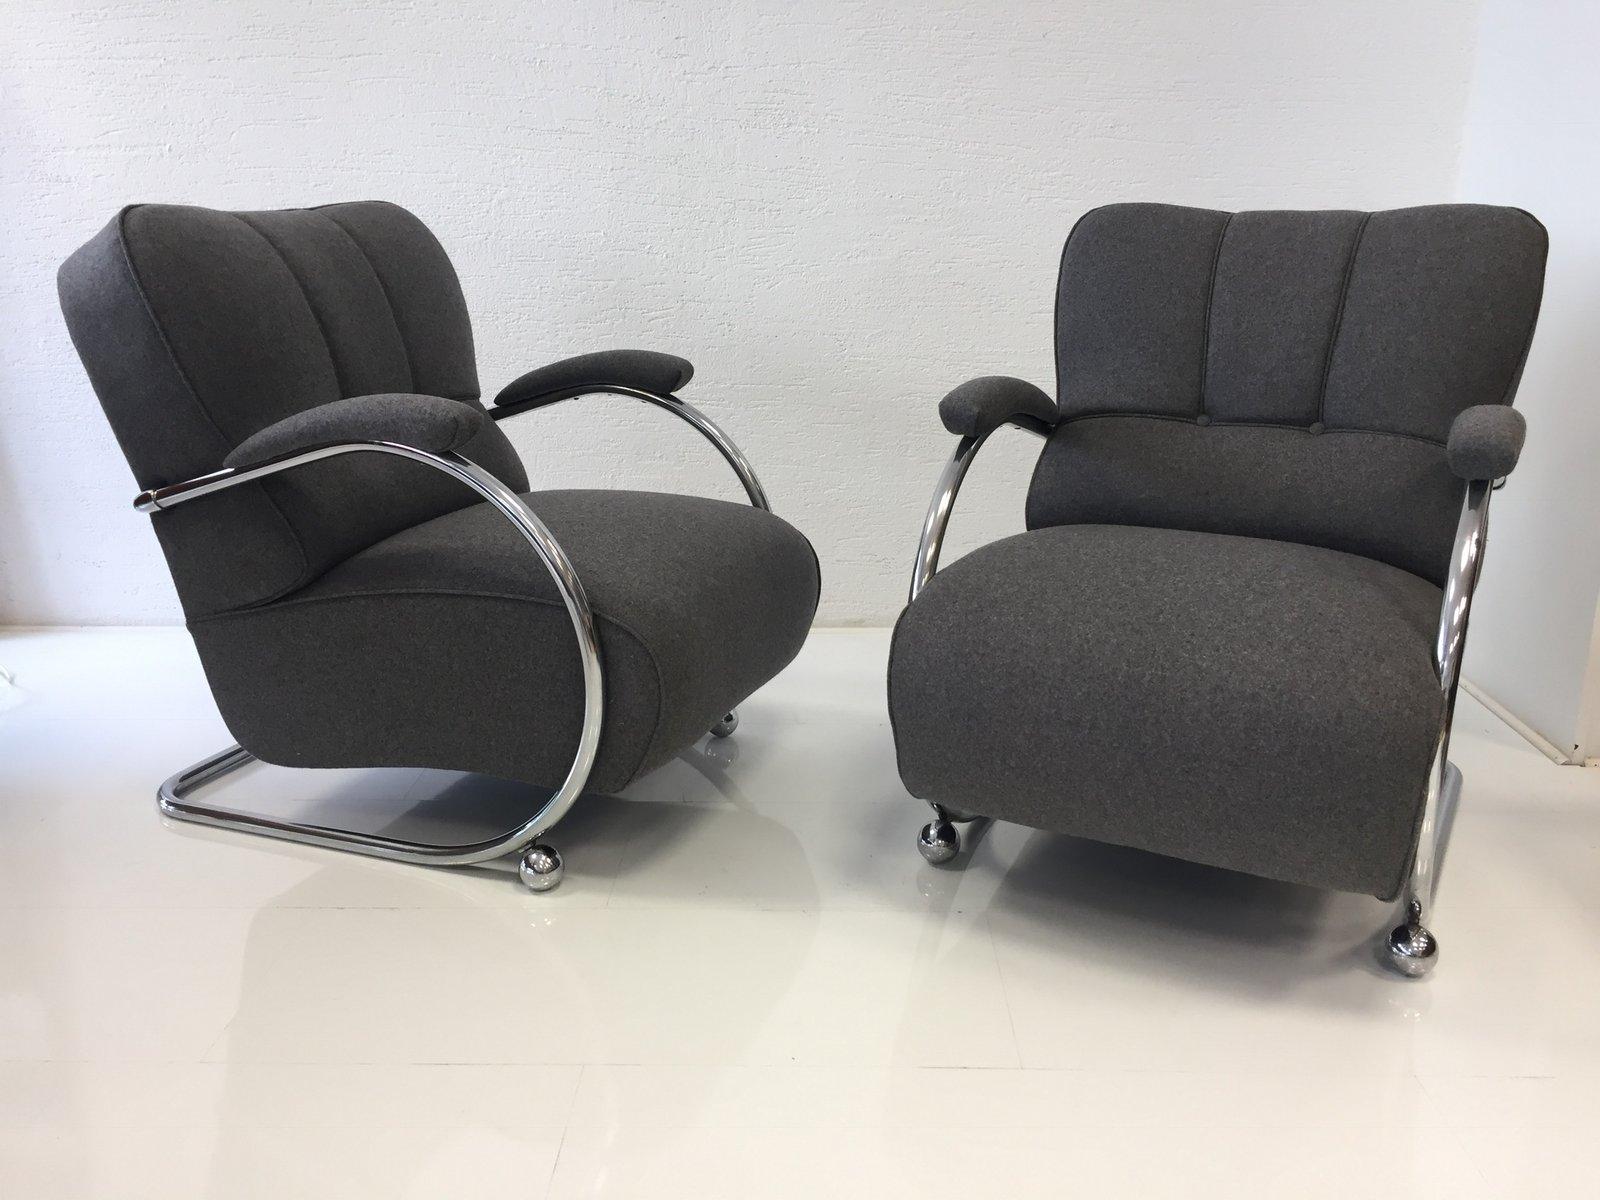 Stahlrohr Sessel vintage stahlrohr sessel 2er set bei pamono kaufen